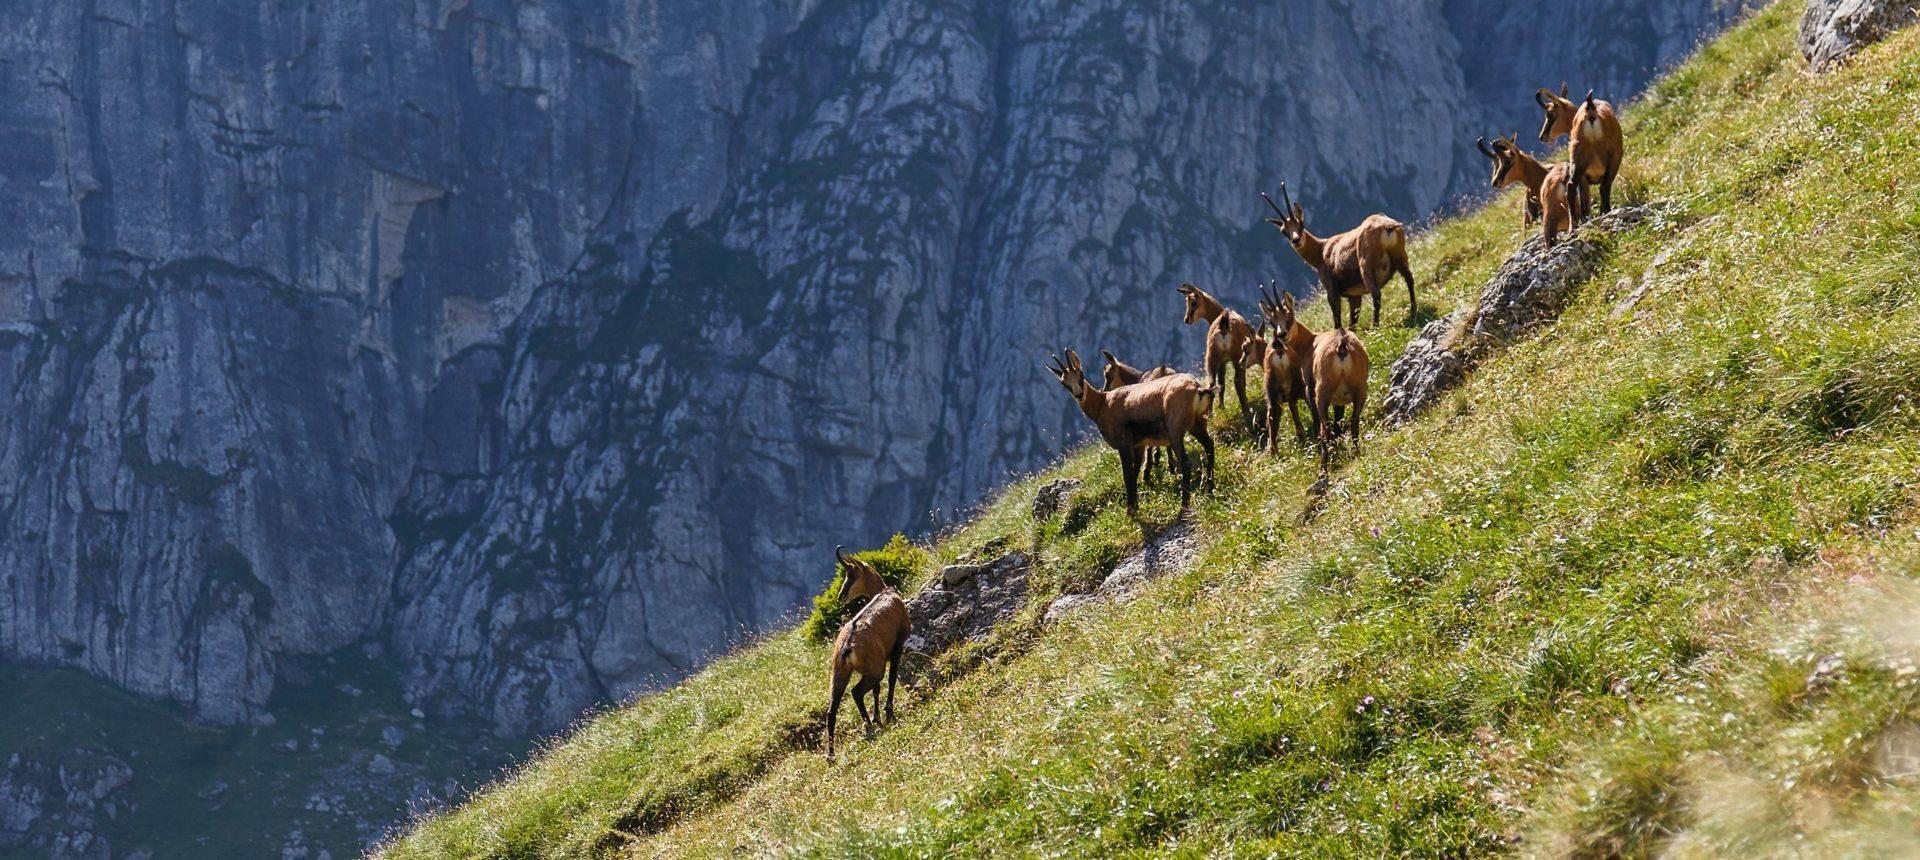 Chamois, Carpathian Mountains, Romania Shutterstock 1091287208